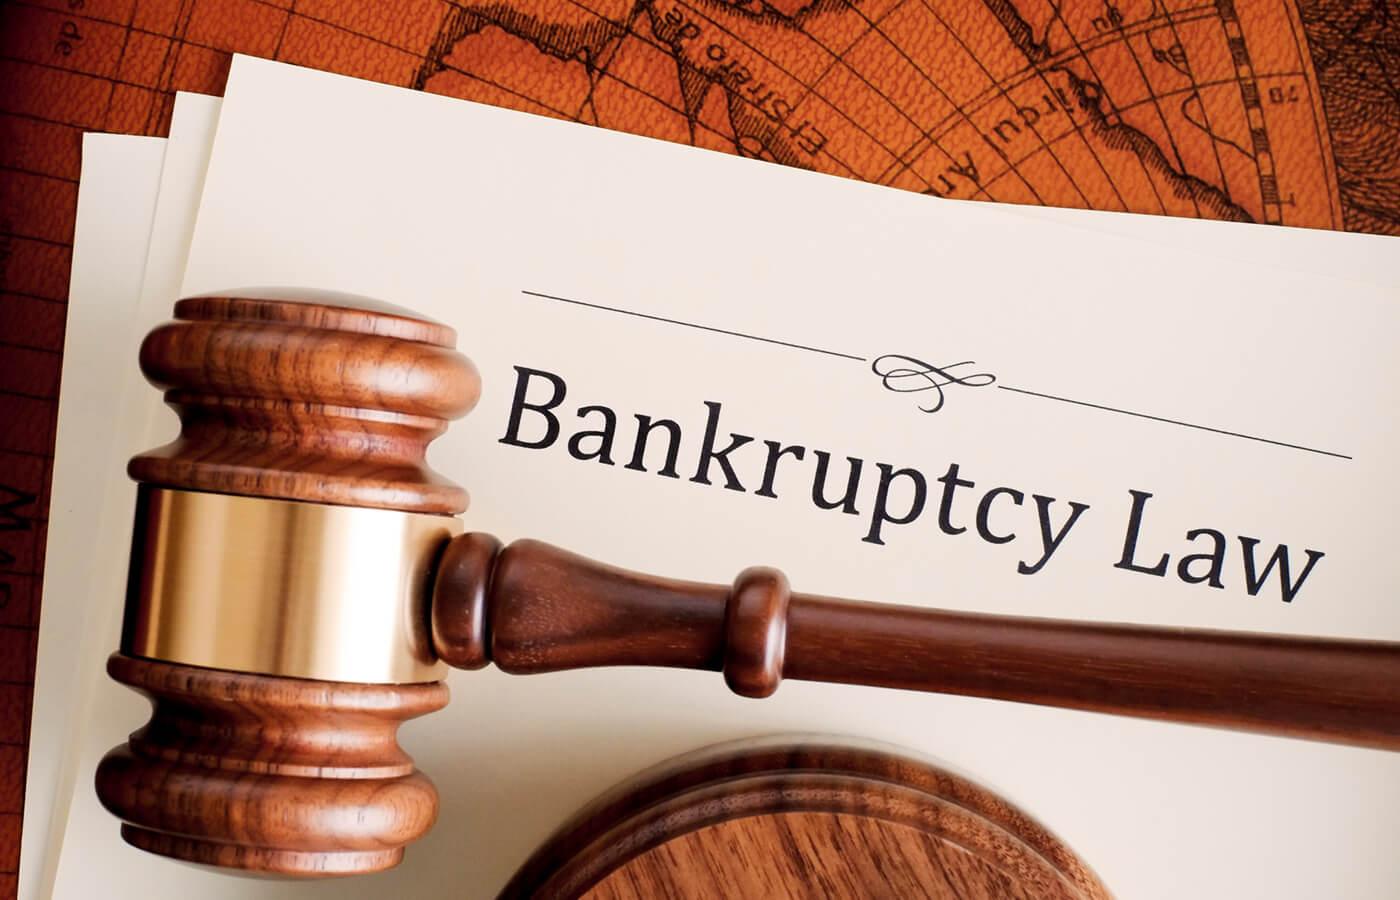 How Often Can A Person File A Bankruptcy David Sklar & Associates